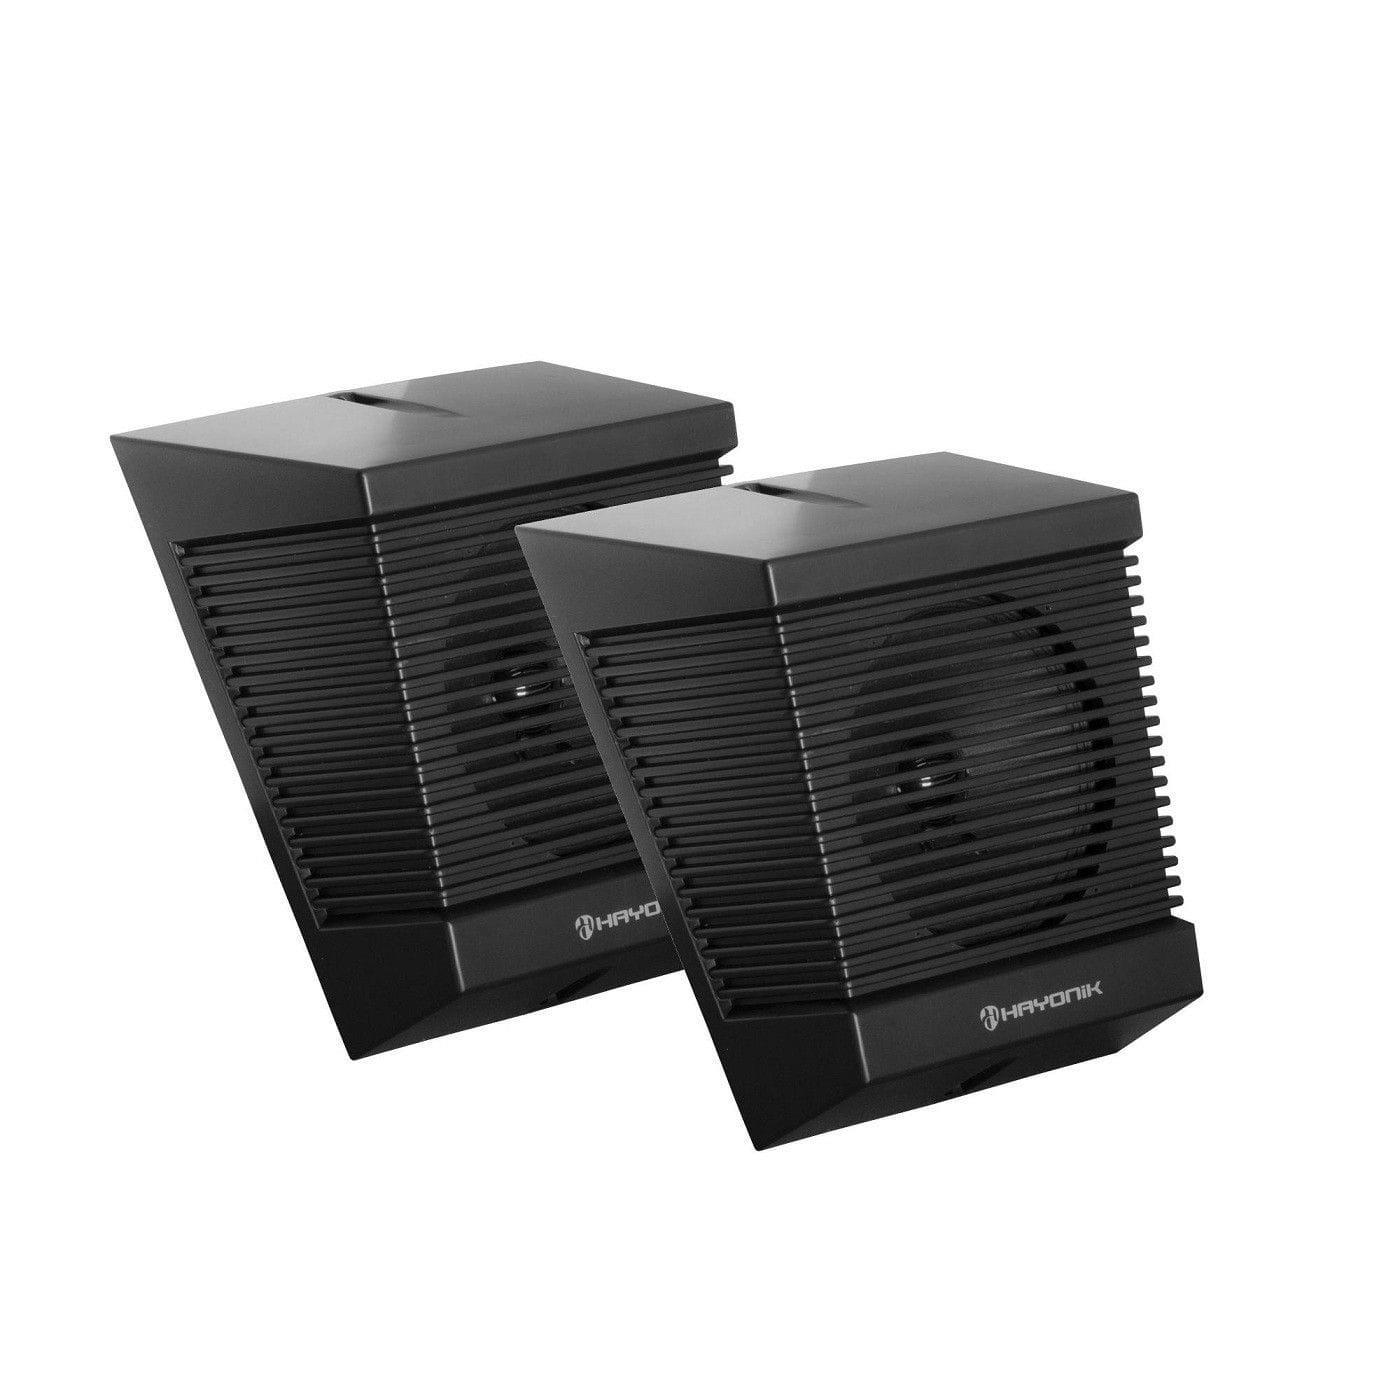 Caixa Acústica para Som Ambiente Hayonik SA-140T (Par/10w RMS/Preta)